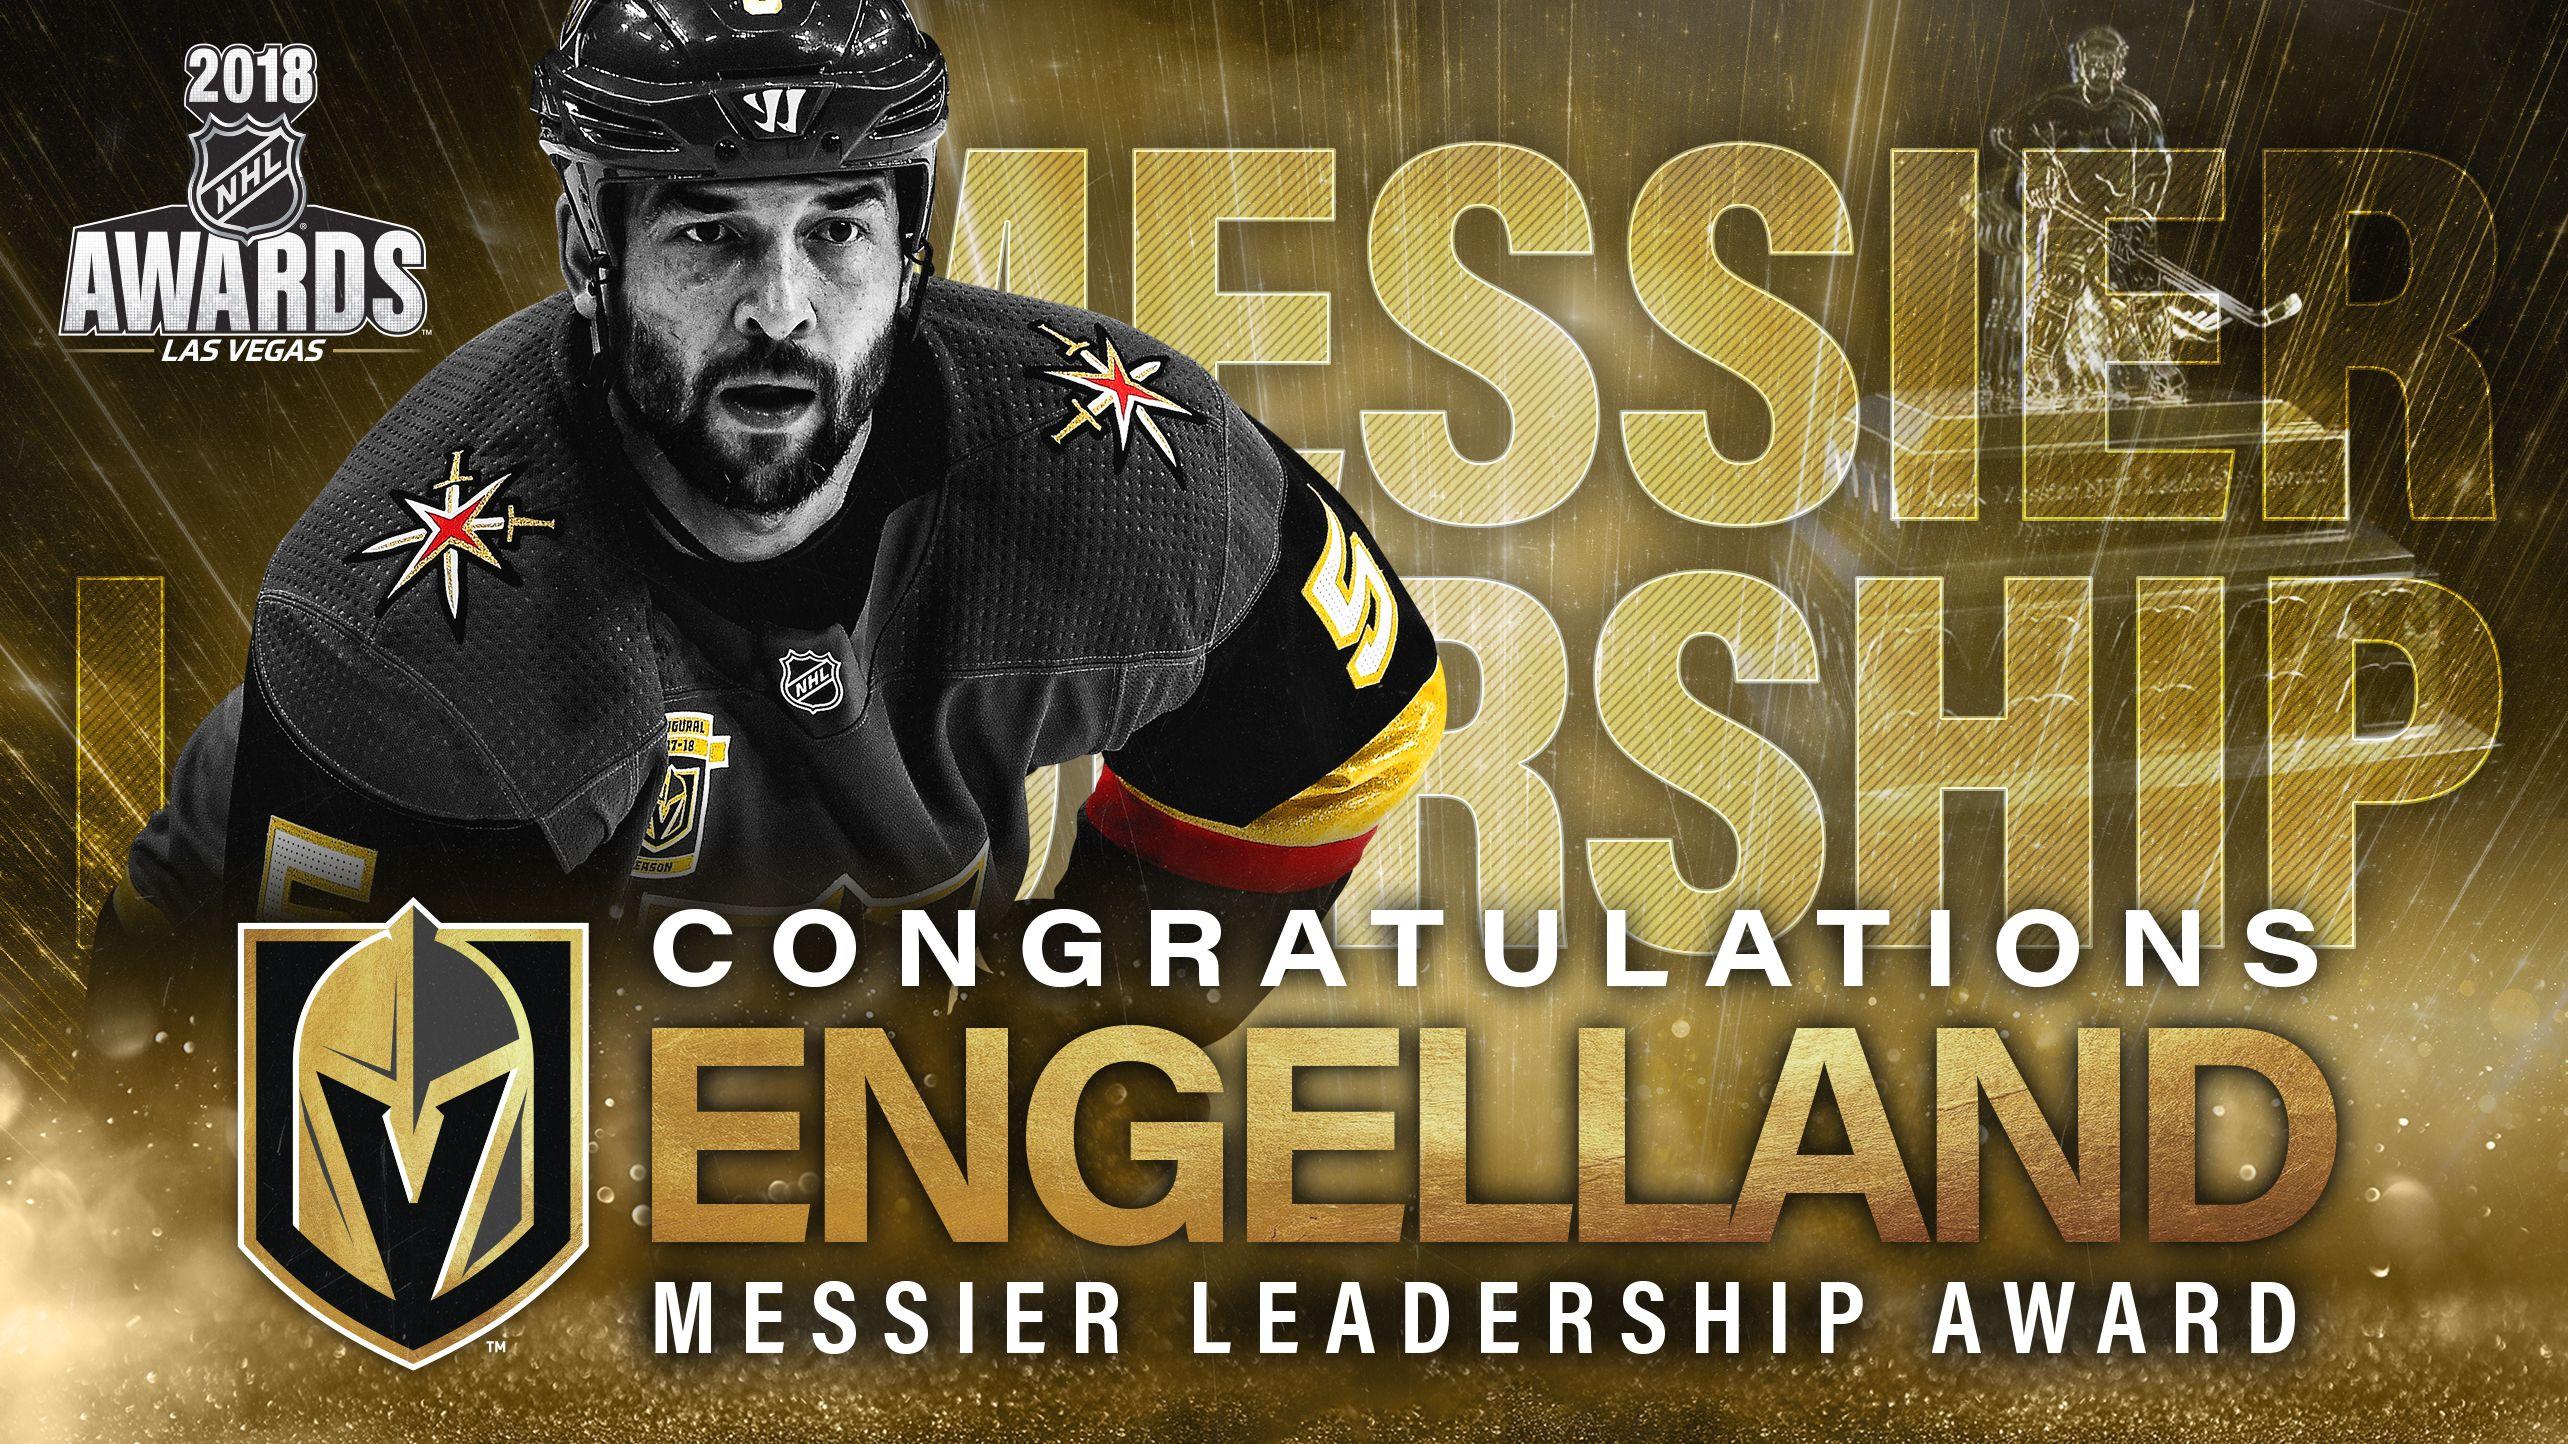 Golden Knights Engelland Presented Mark Messier Nhl Leadership